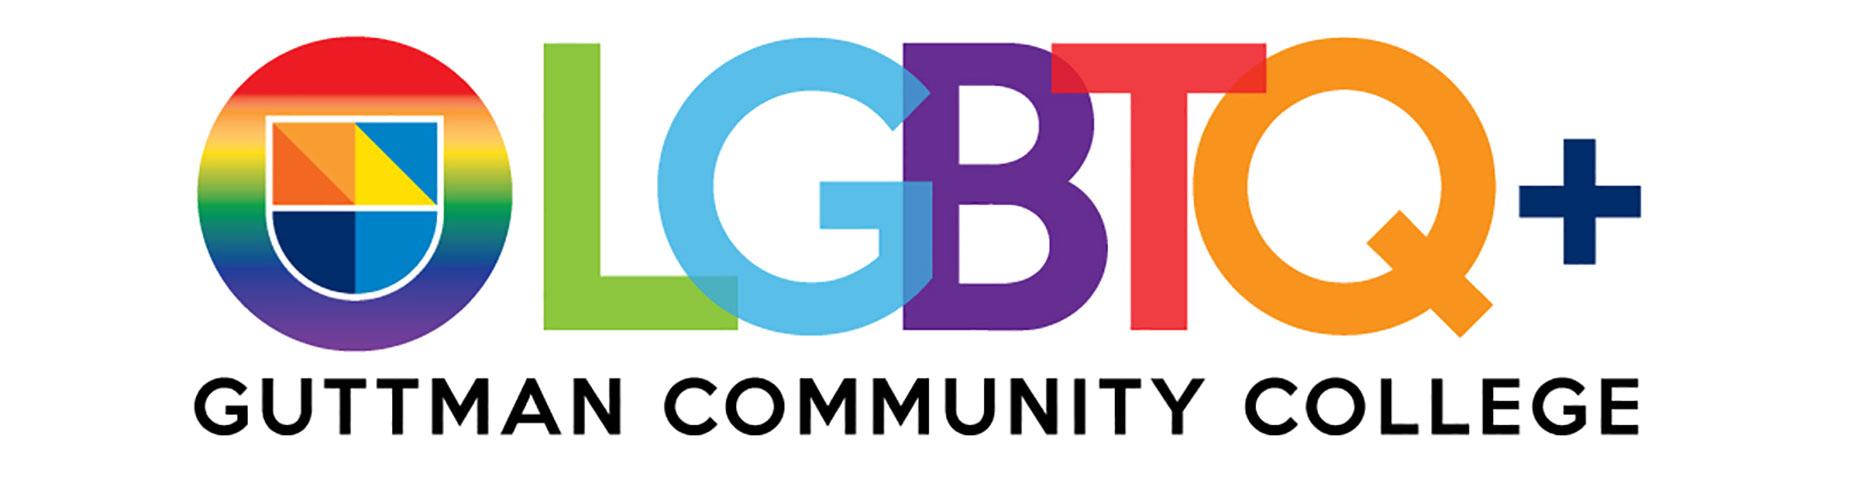 Guttman LGBTQ logo